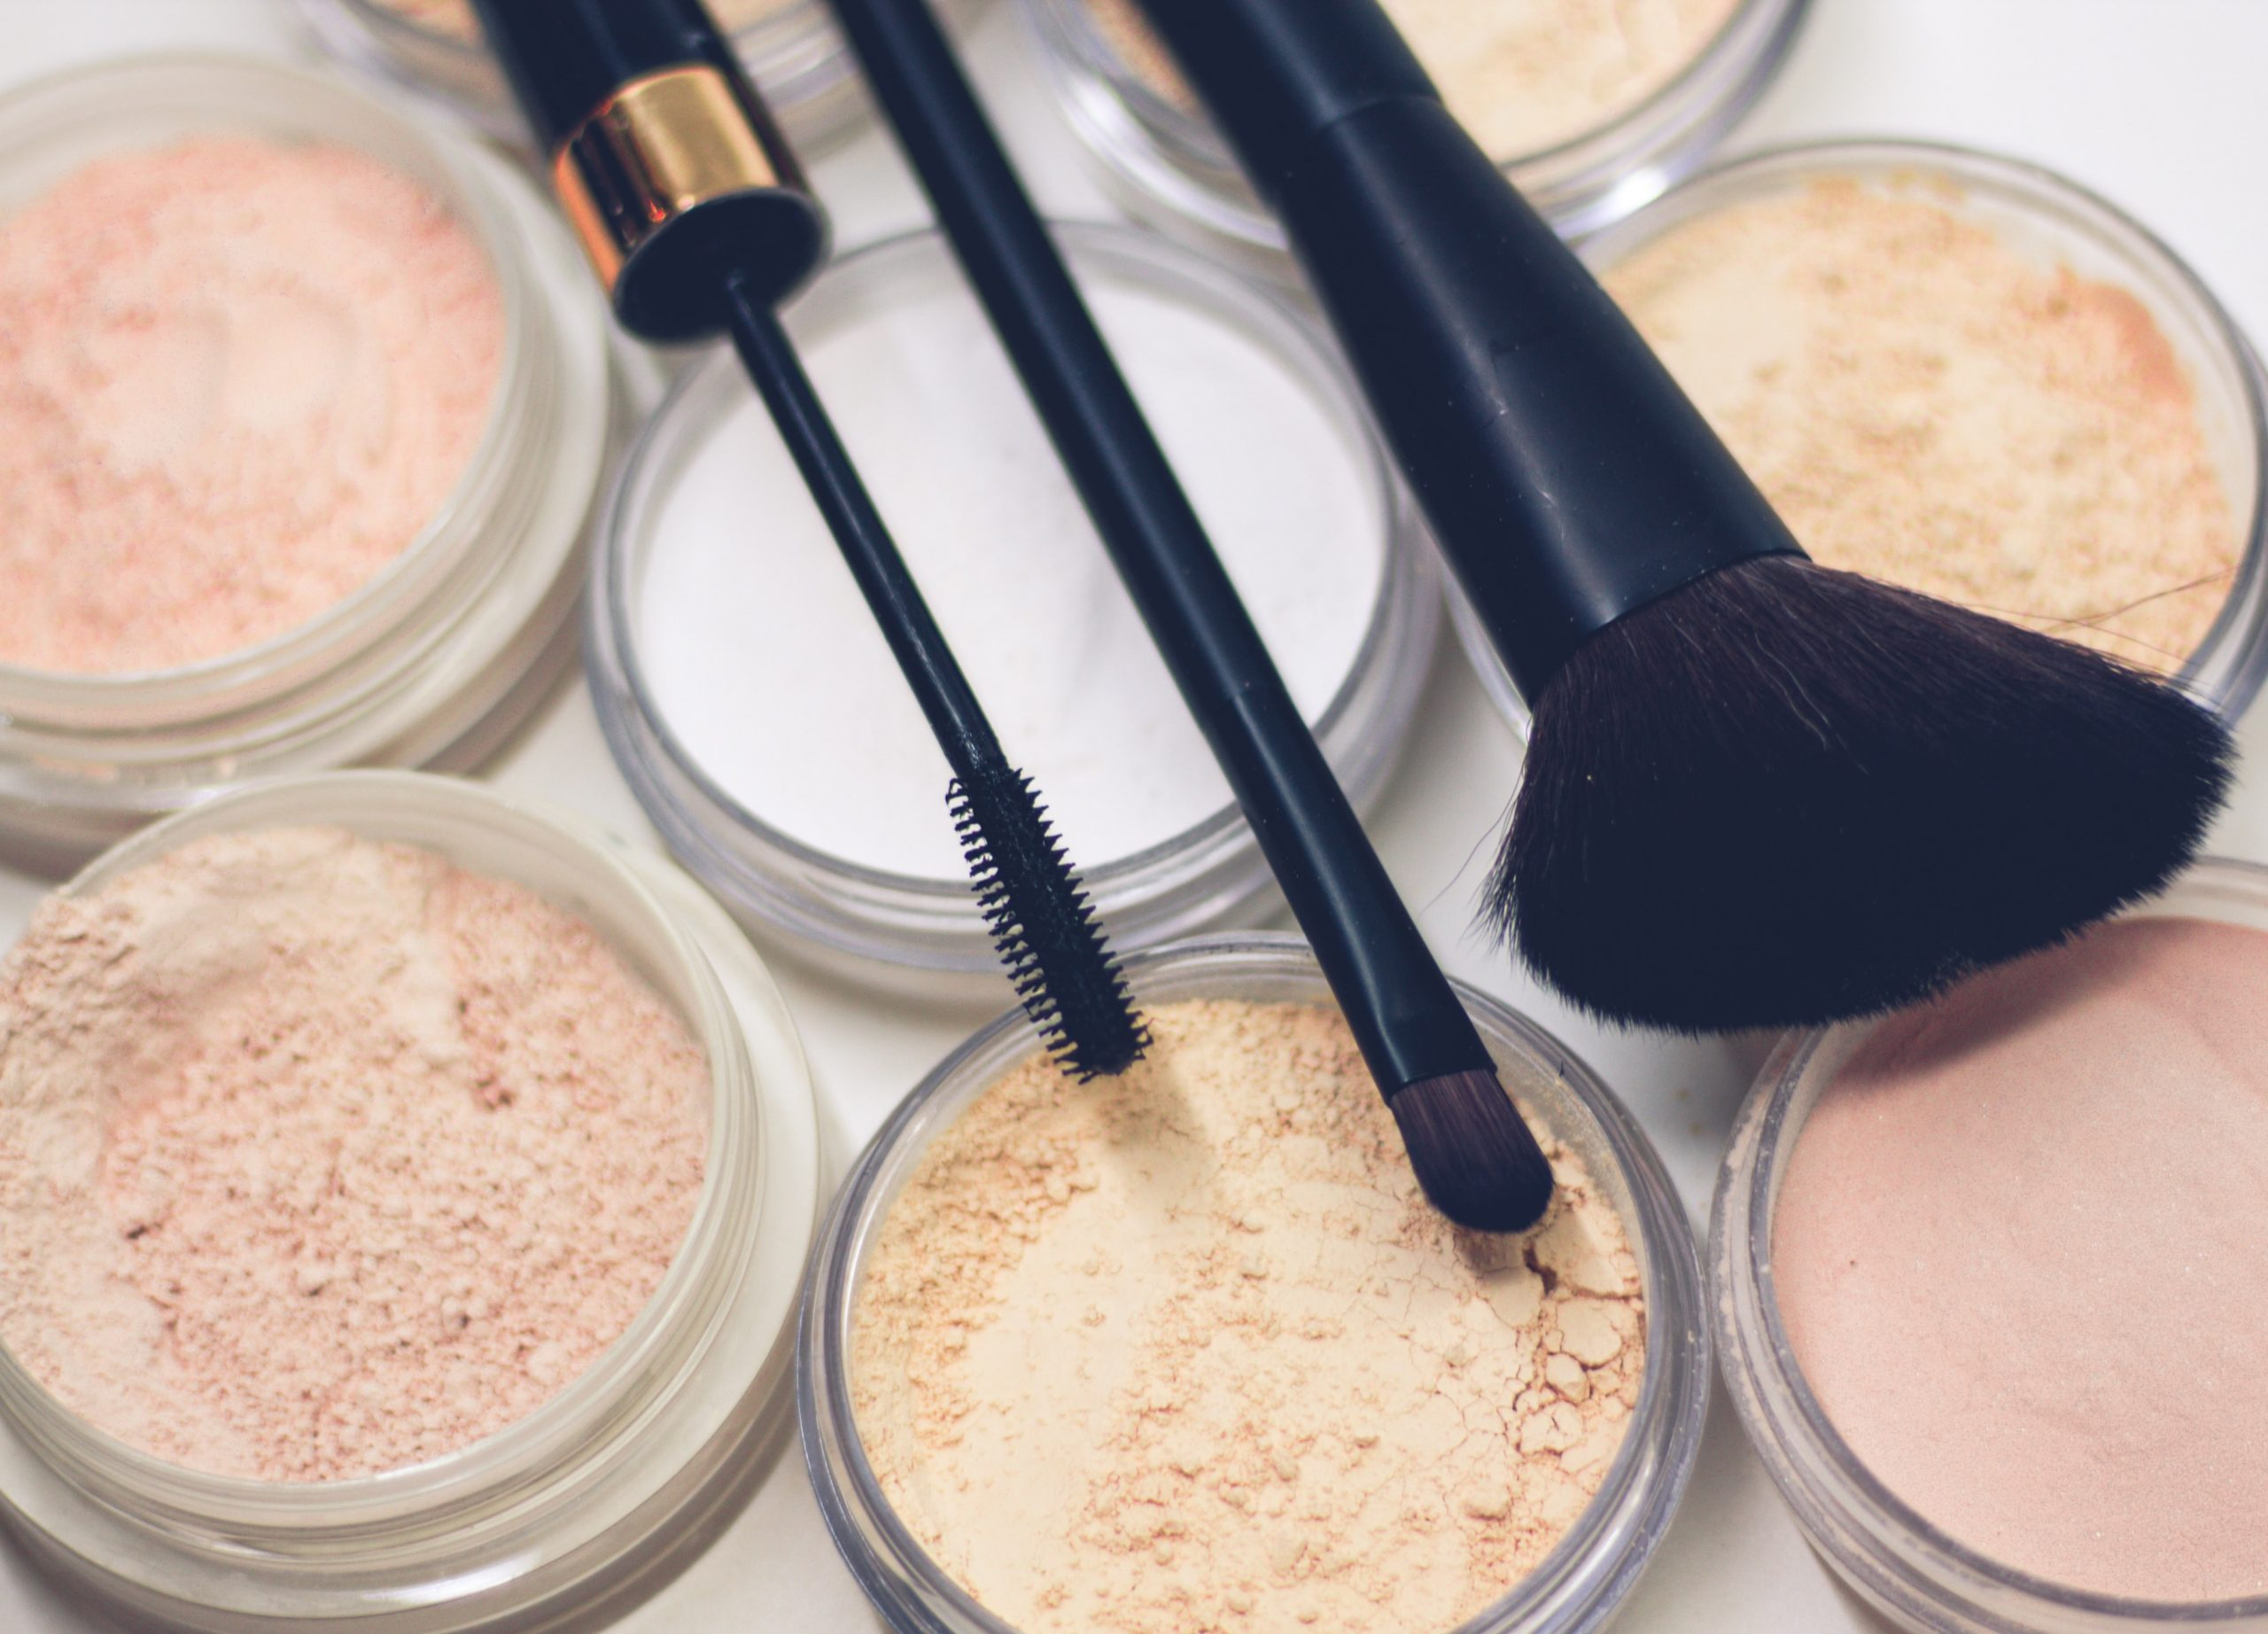 kosmetikemballage